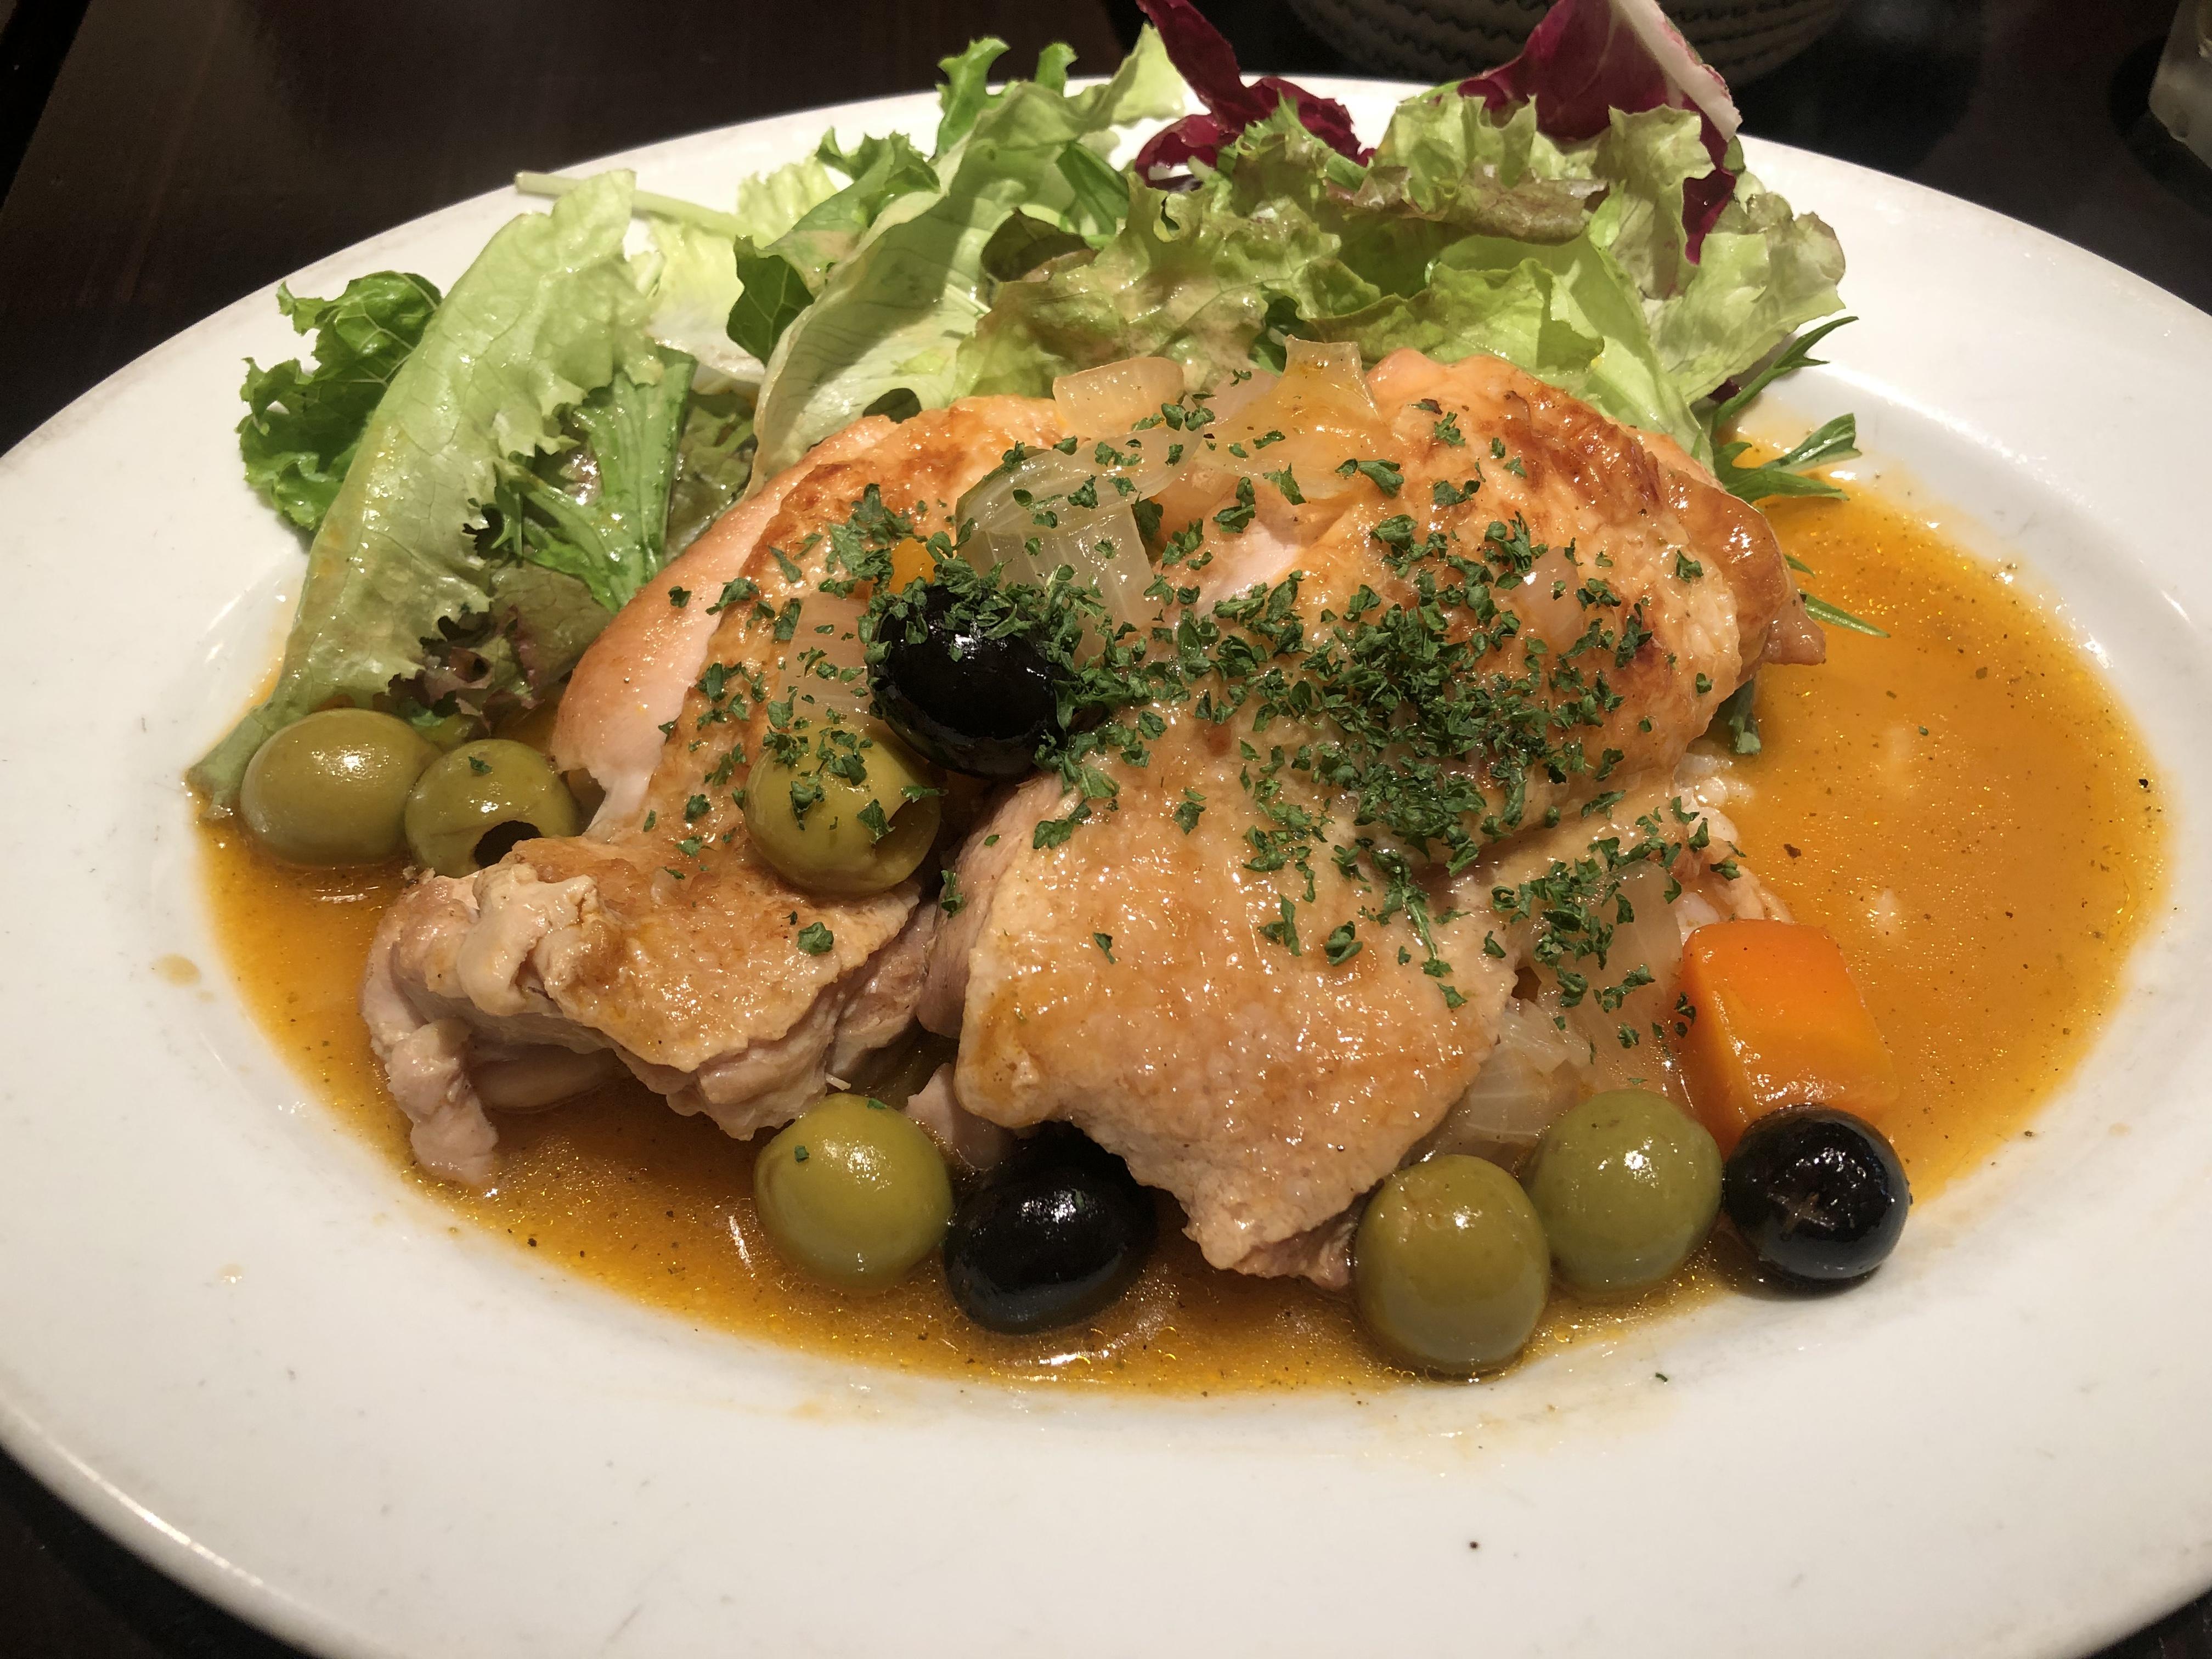 Les pif et dodine (レピフエドディーヌ) 鳥もも肉のプロヴァンス風煮込み